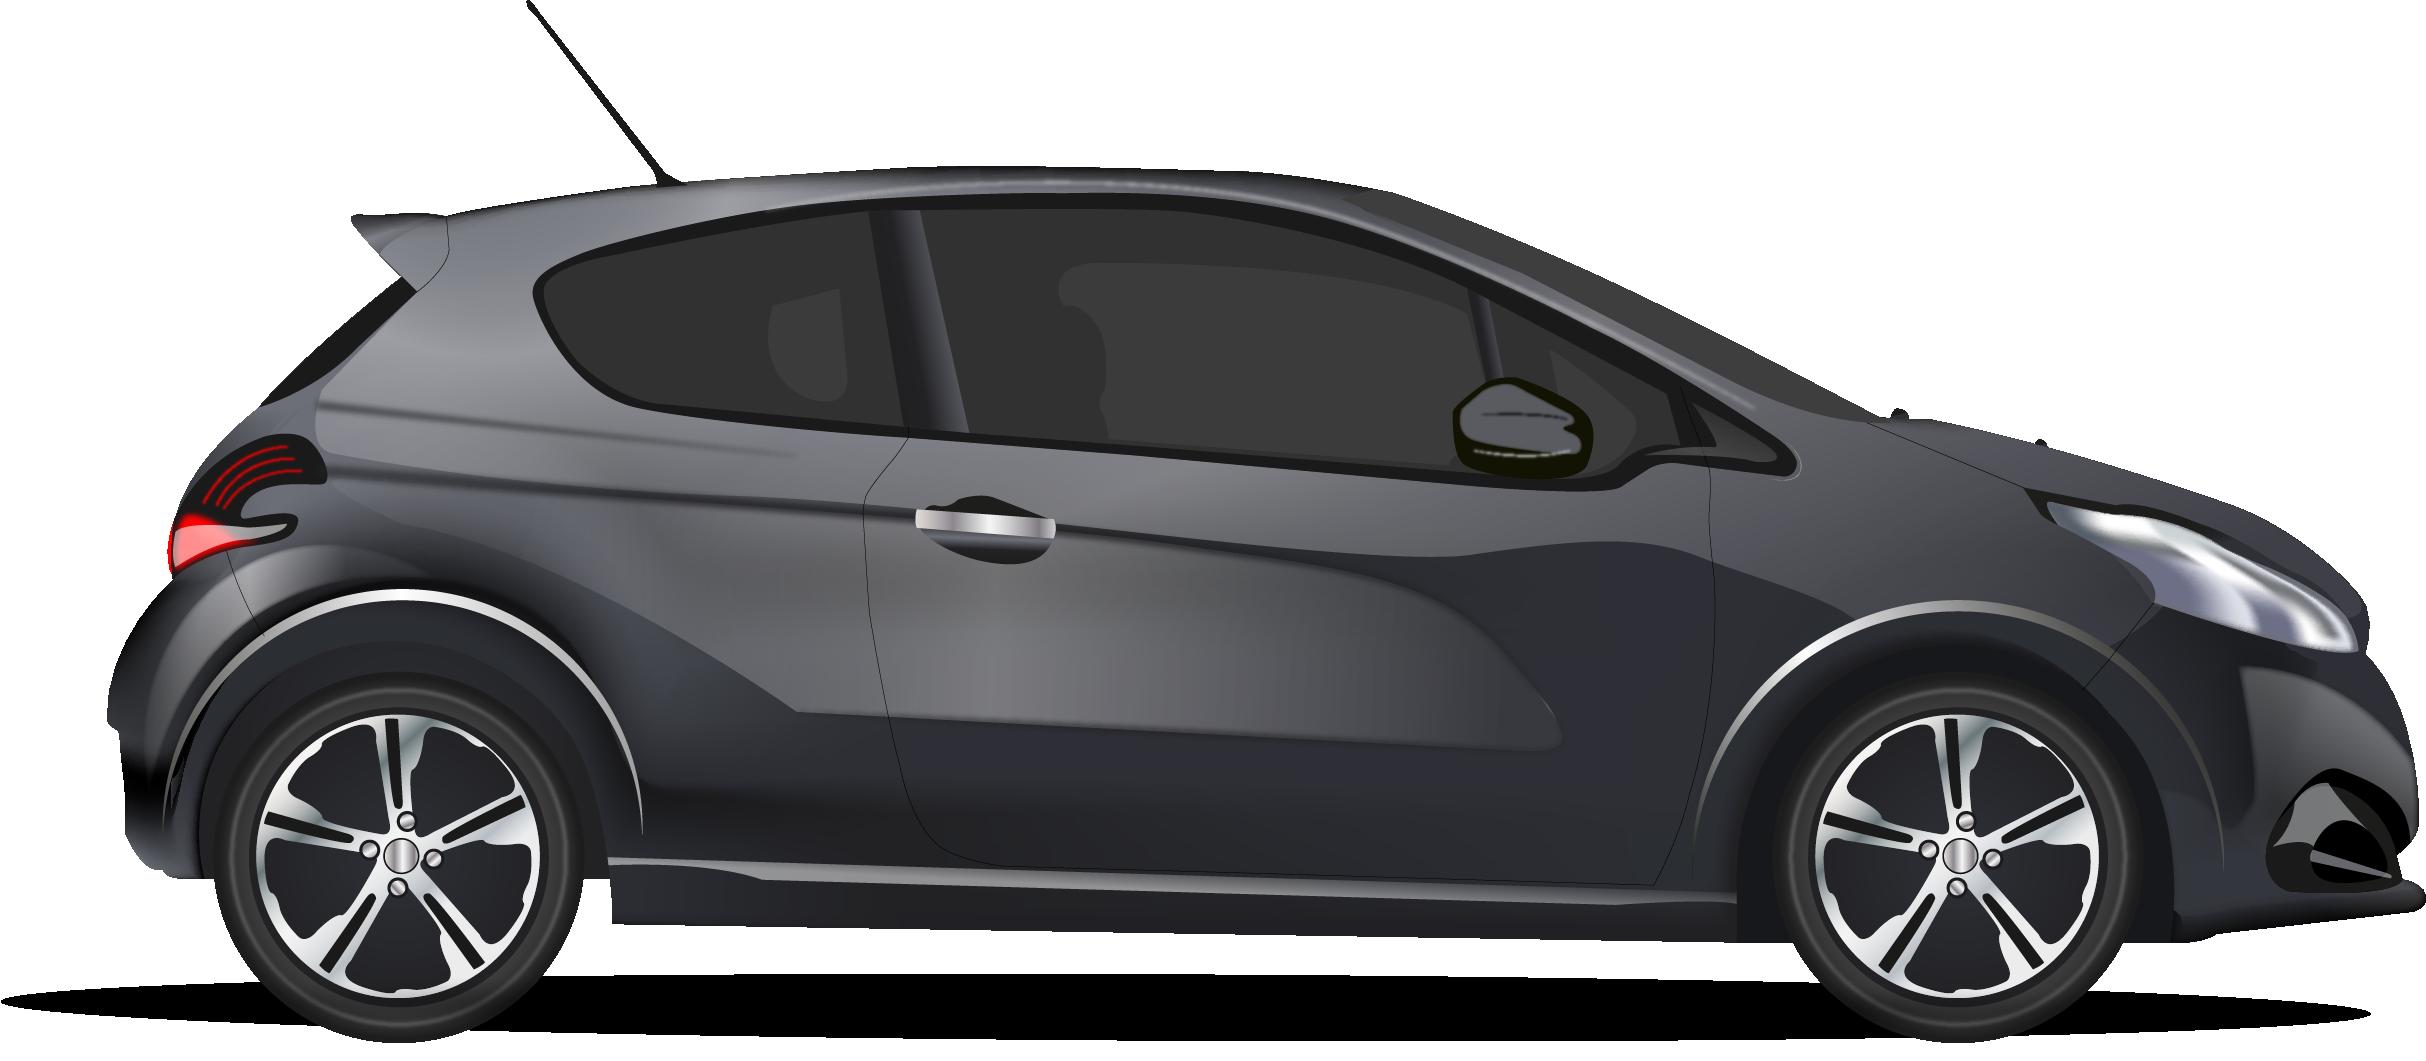 Car PNG Transparent Free Images.